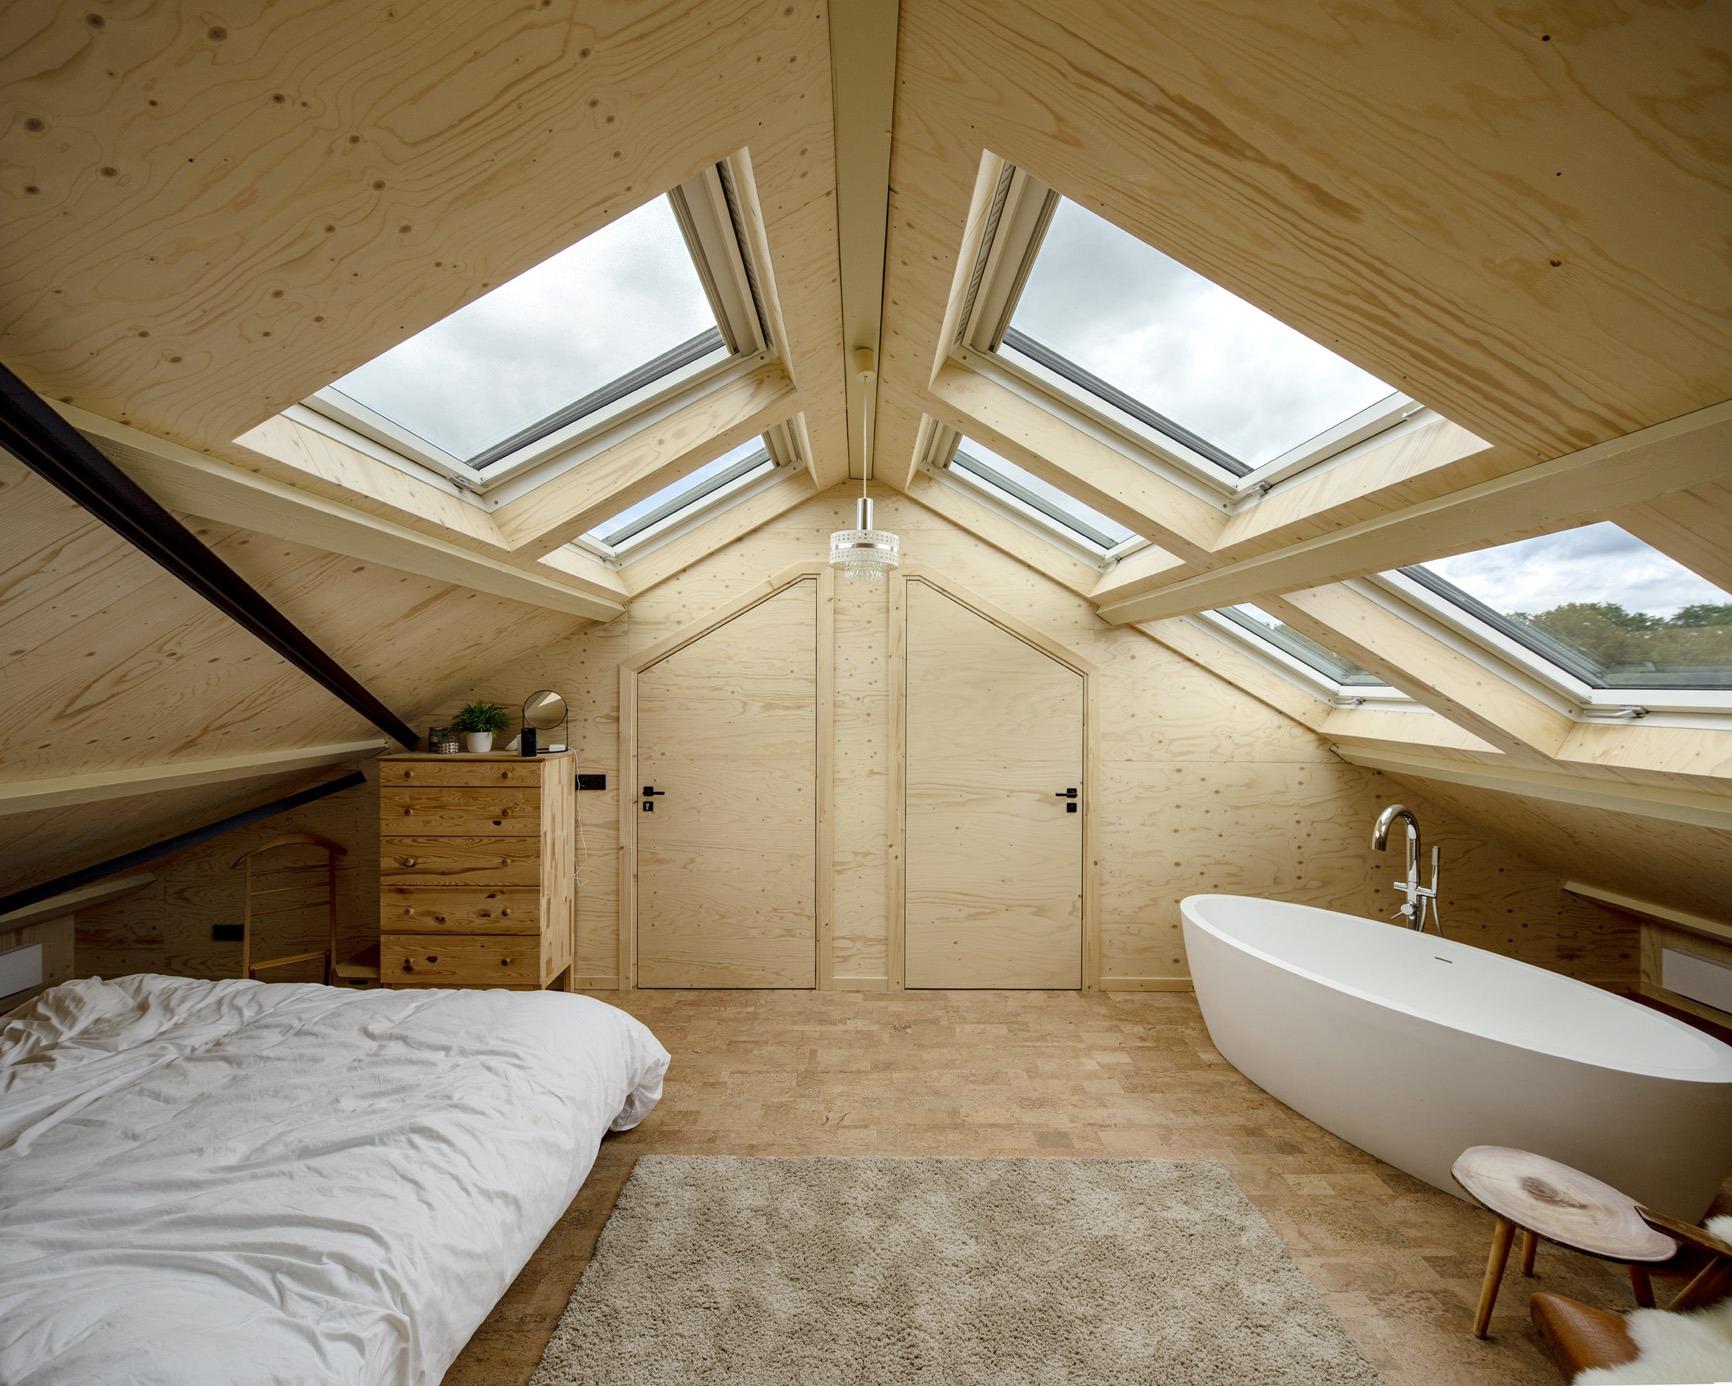 architect loft herbestemming verbouw